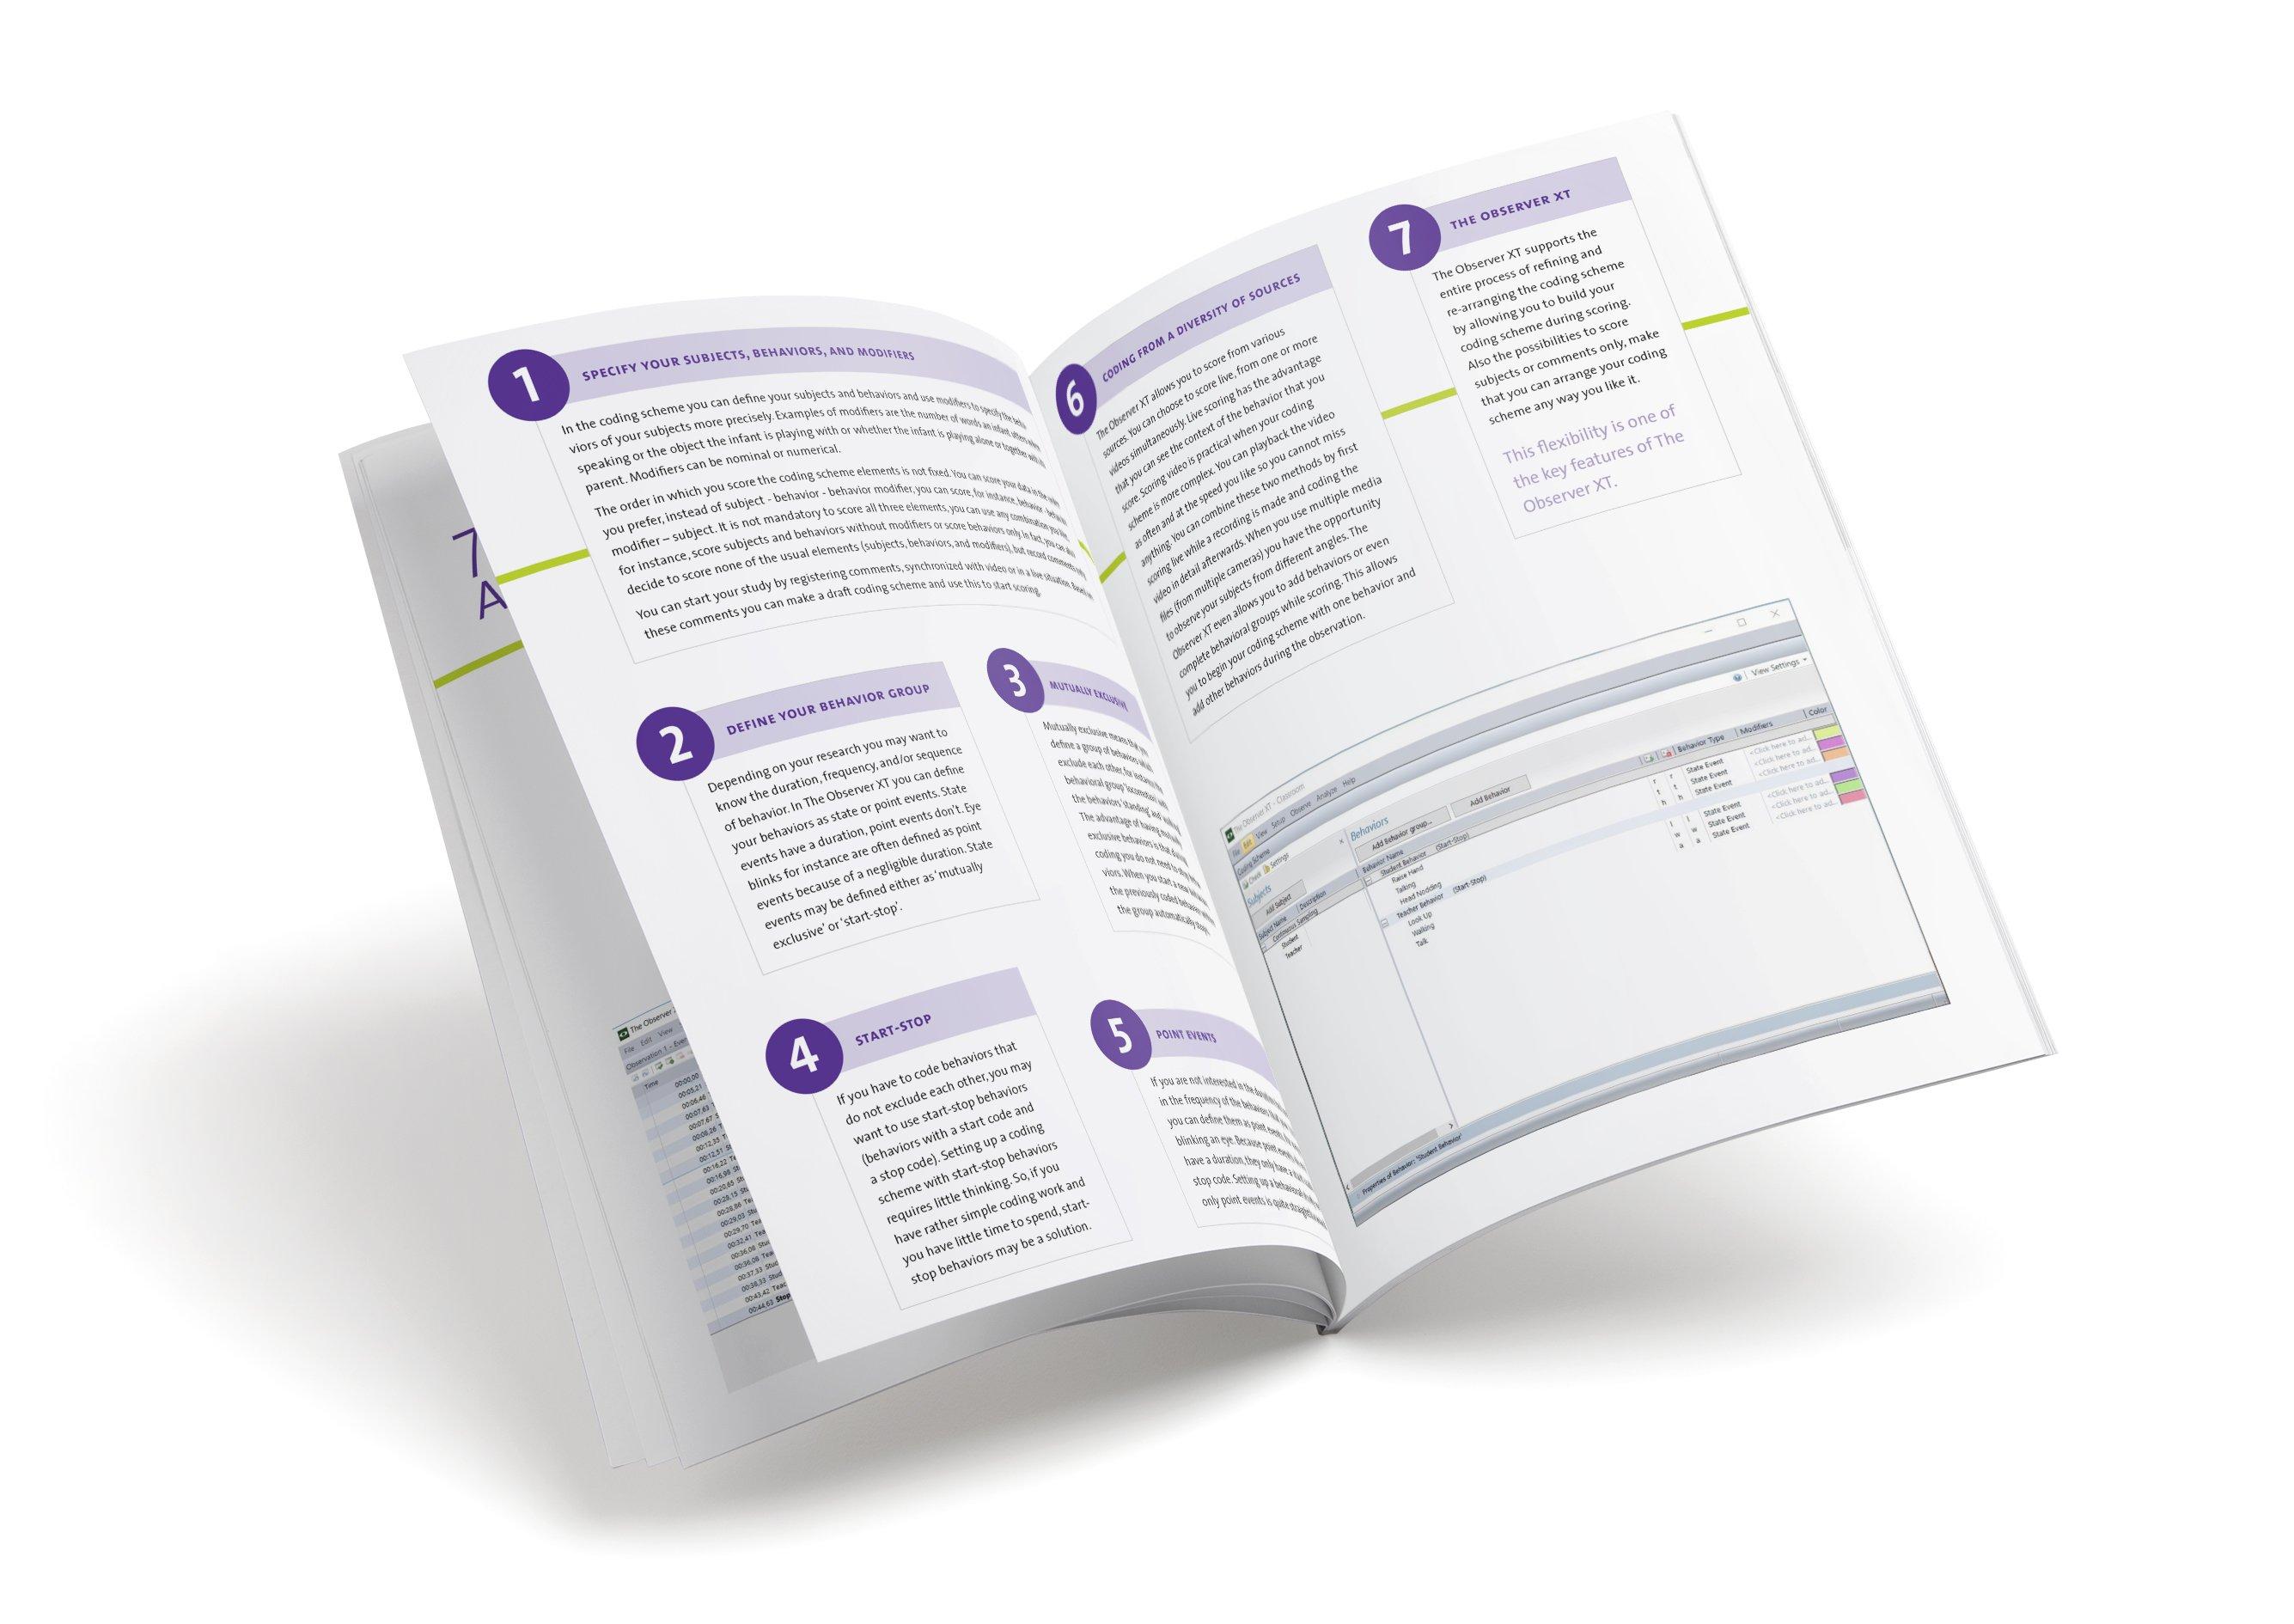 www - white paper - coding schemes